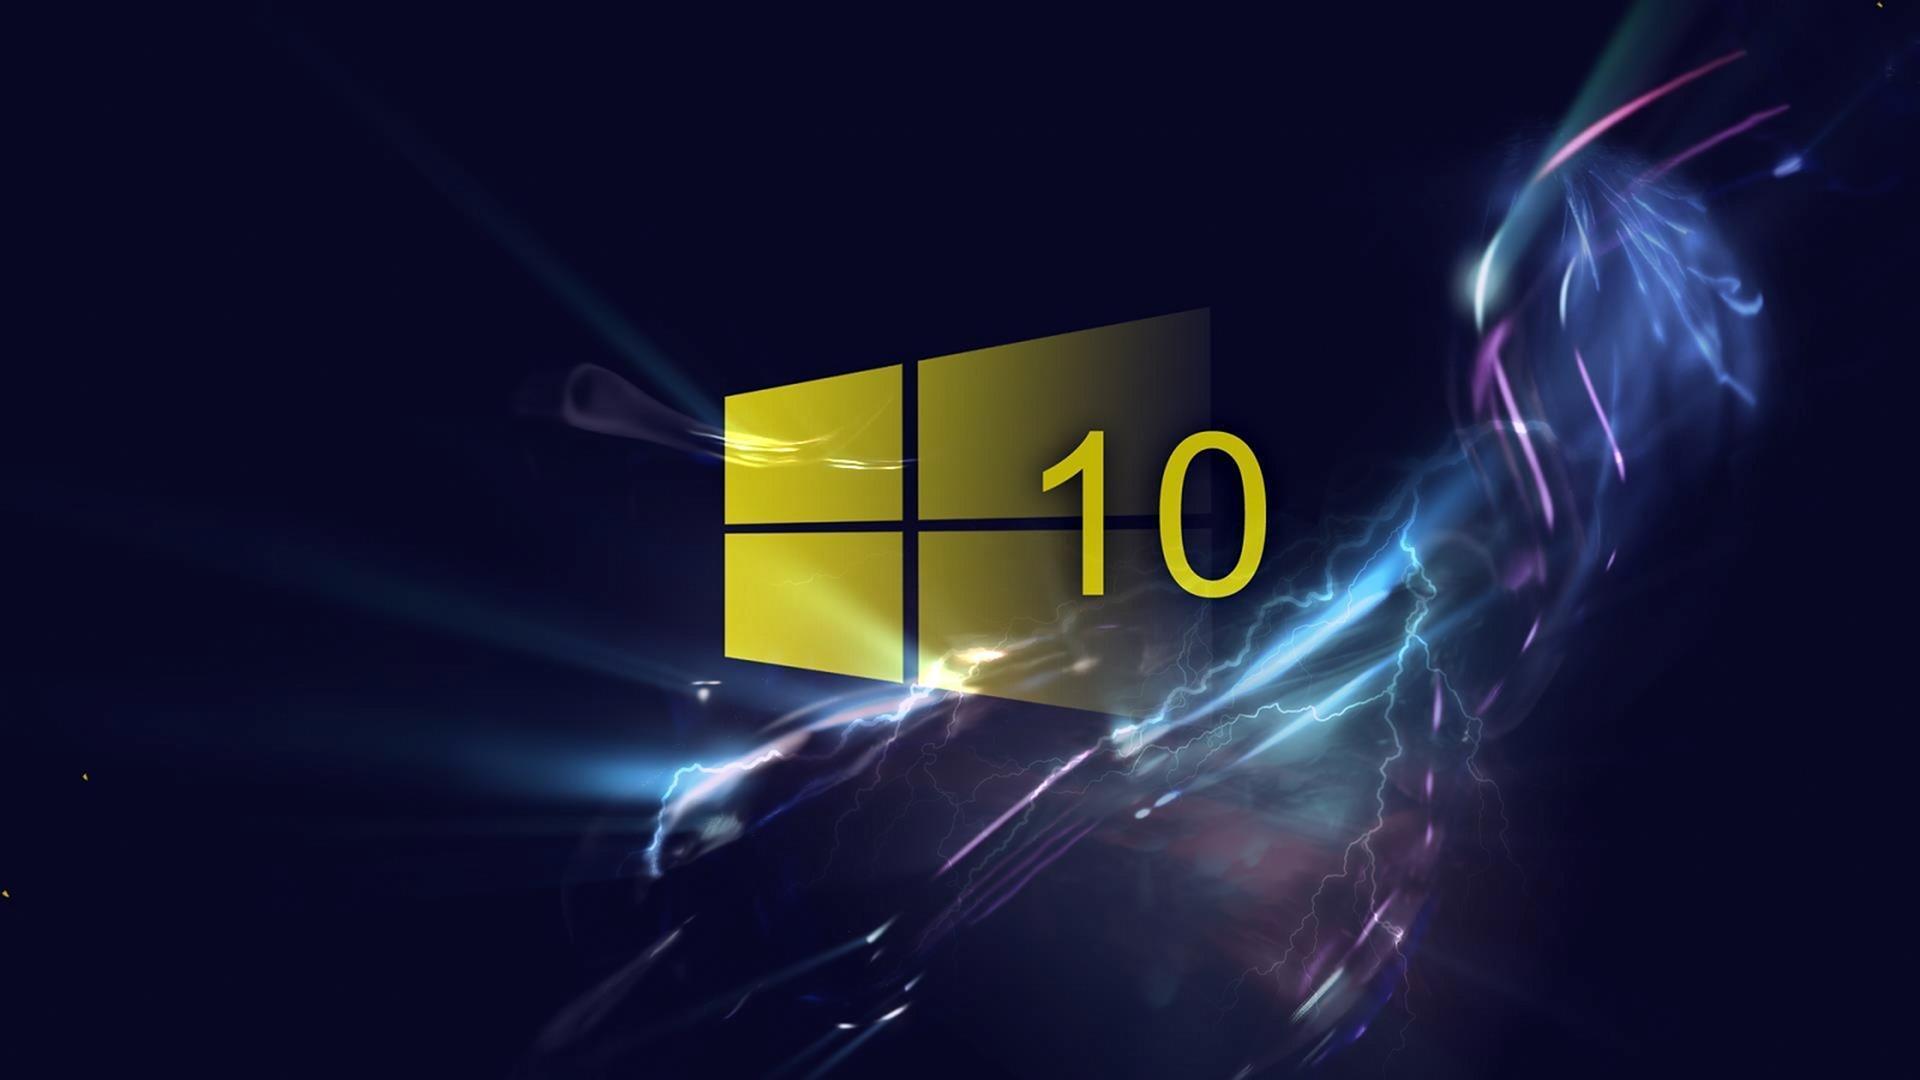 Windows 10 Wallpapers 12